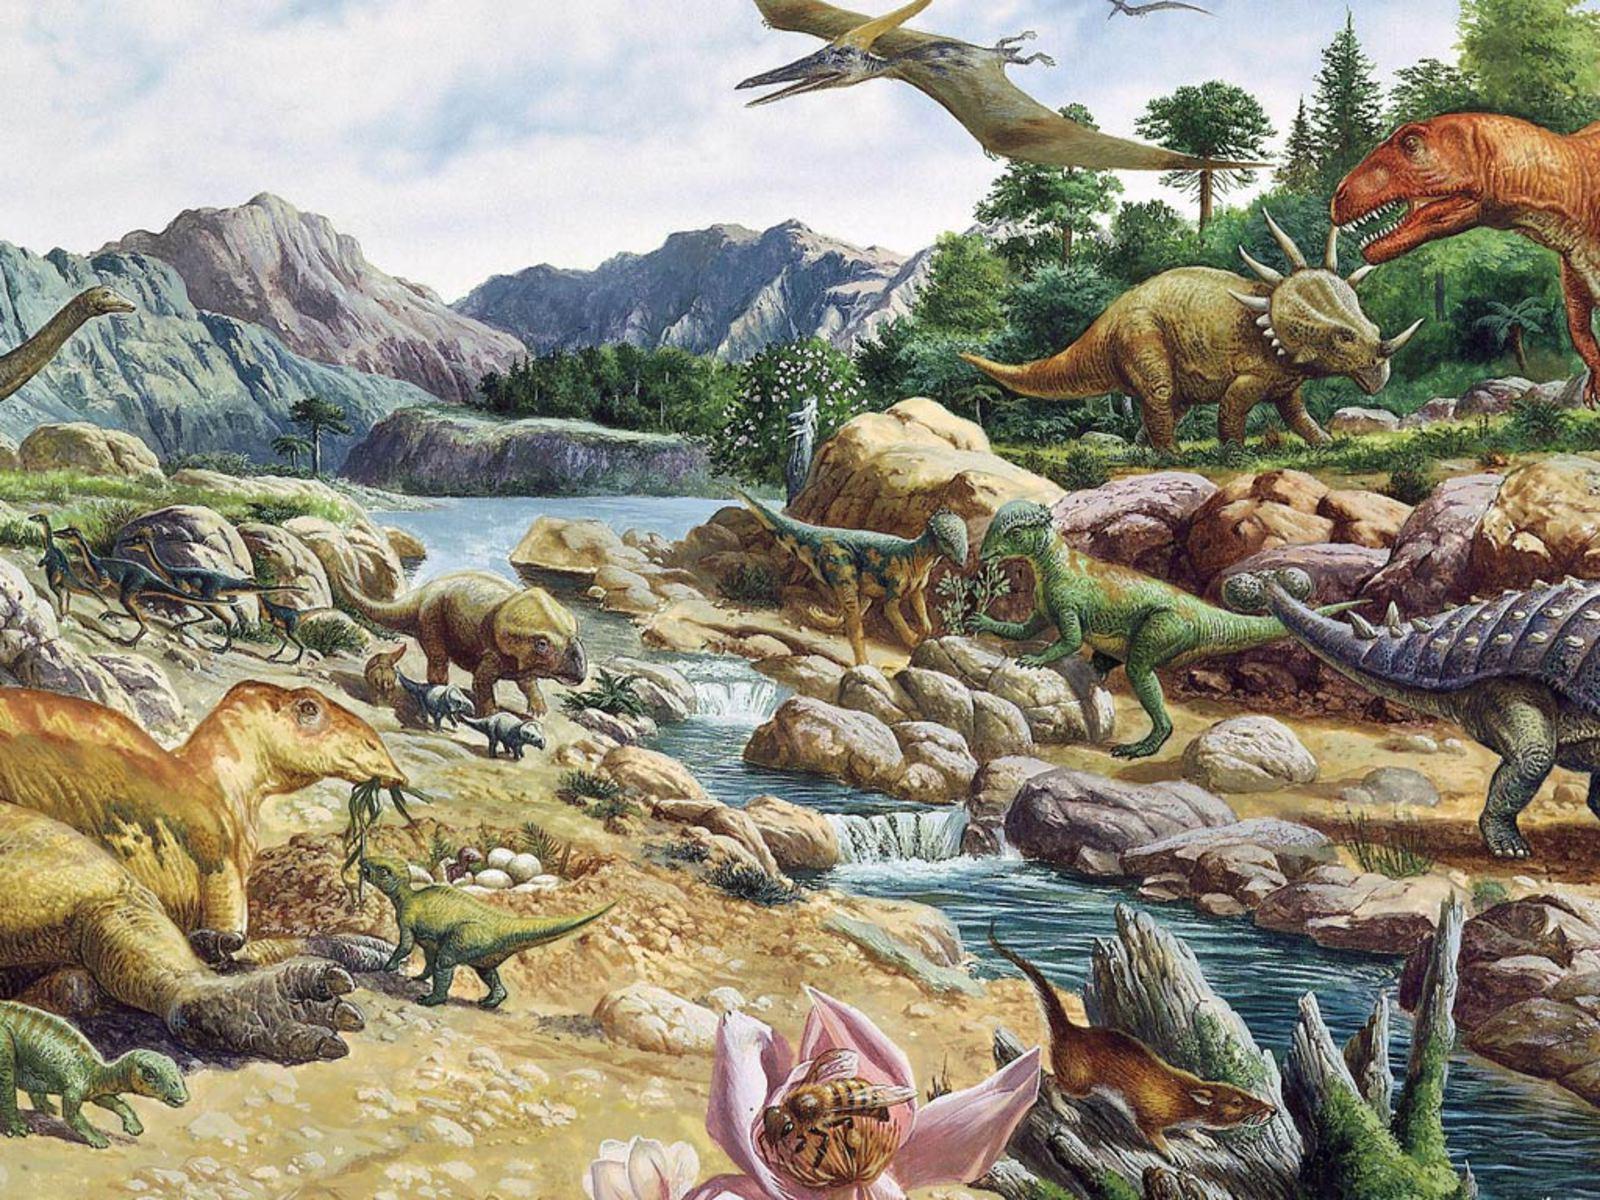 Dinosaur Hd Wallpaper Wallpapersafari